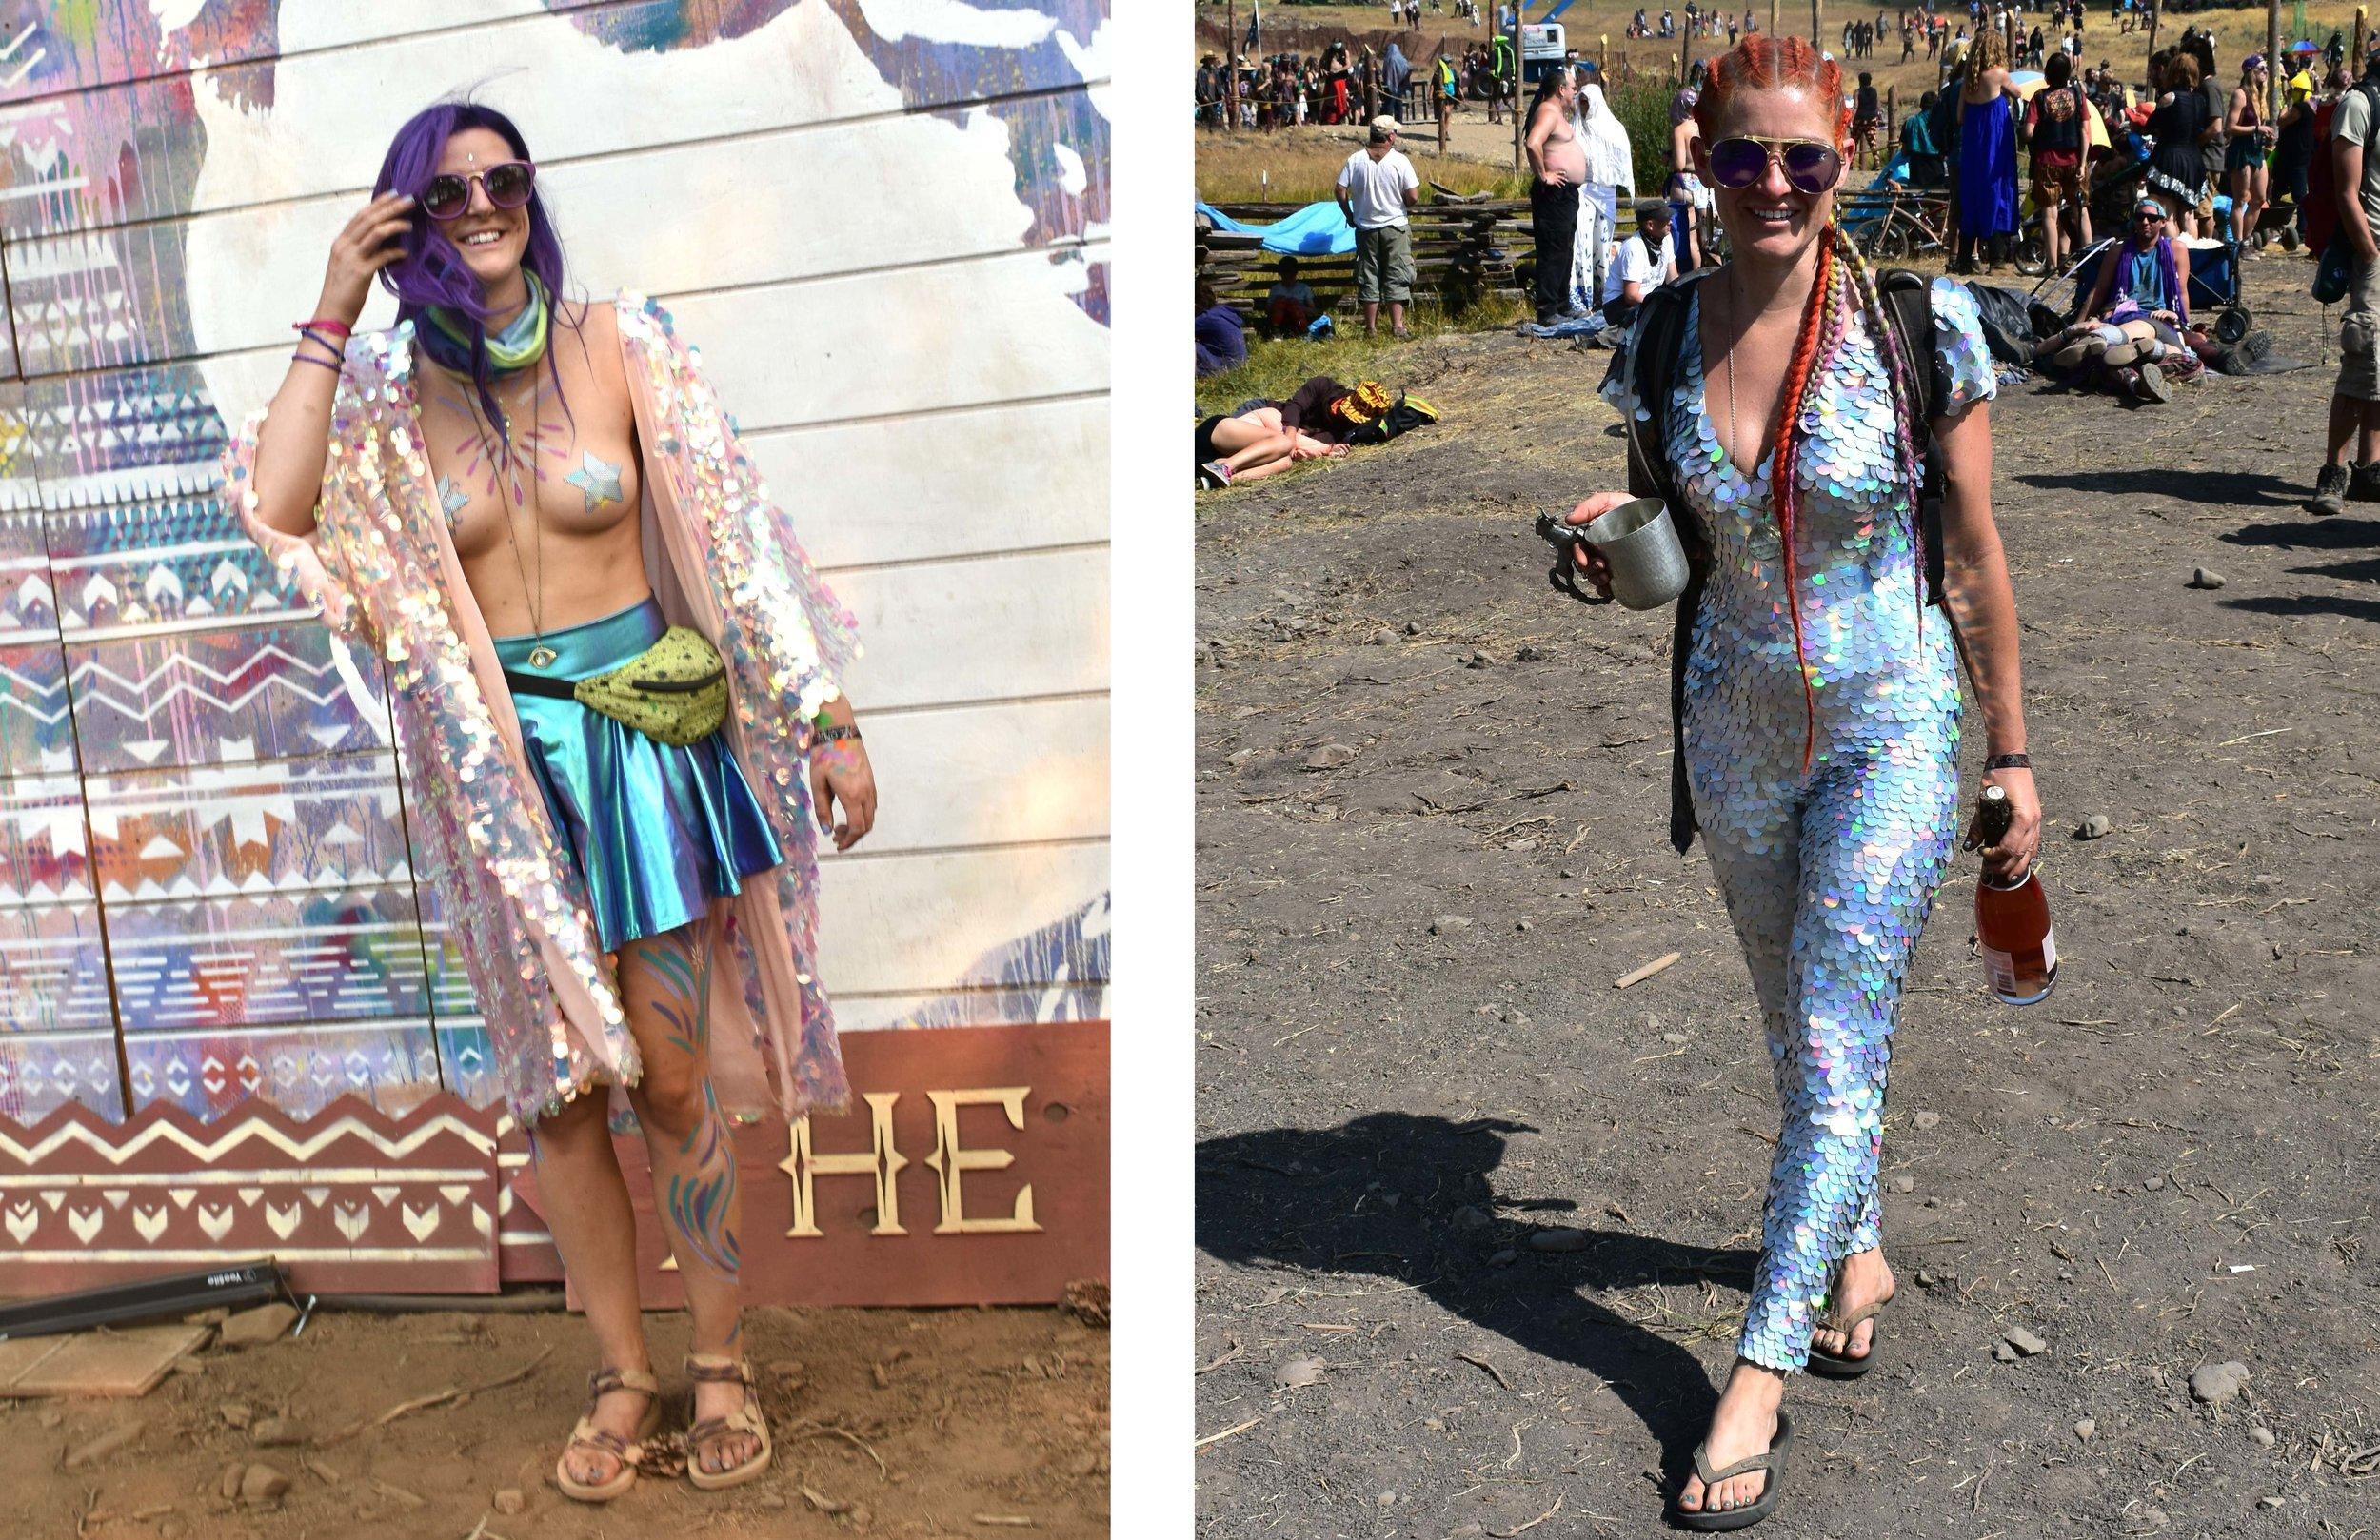 Oregon Eclipse 2017 -Symbiosis - Big Summit Prairie - Envision Festival - Sonic Bloom - Rainbow Serpent - Jaded London - Chrome Monarchy - Style Guide - Florum Magazine - Hadra - Global Gathering - Lighting in a Bottle - Burning Man - Burner Babes - Sequins